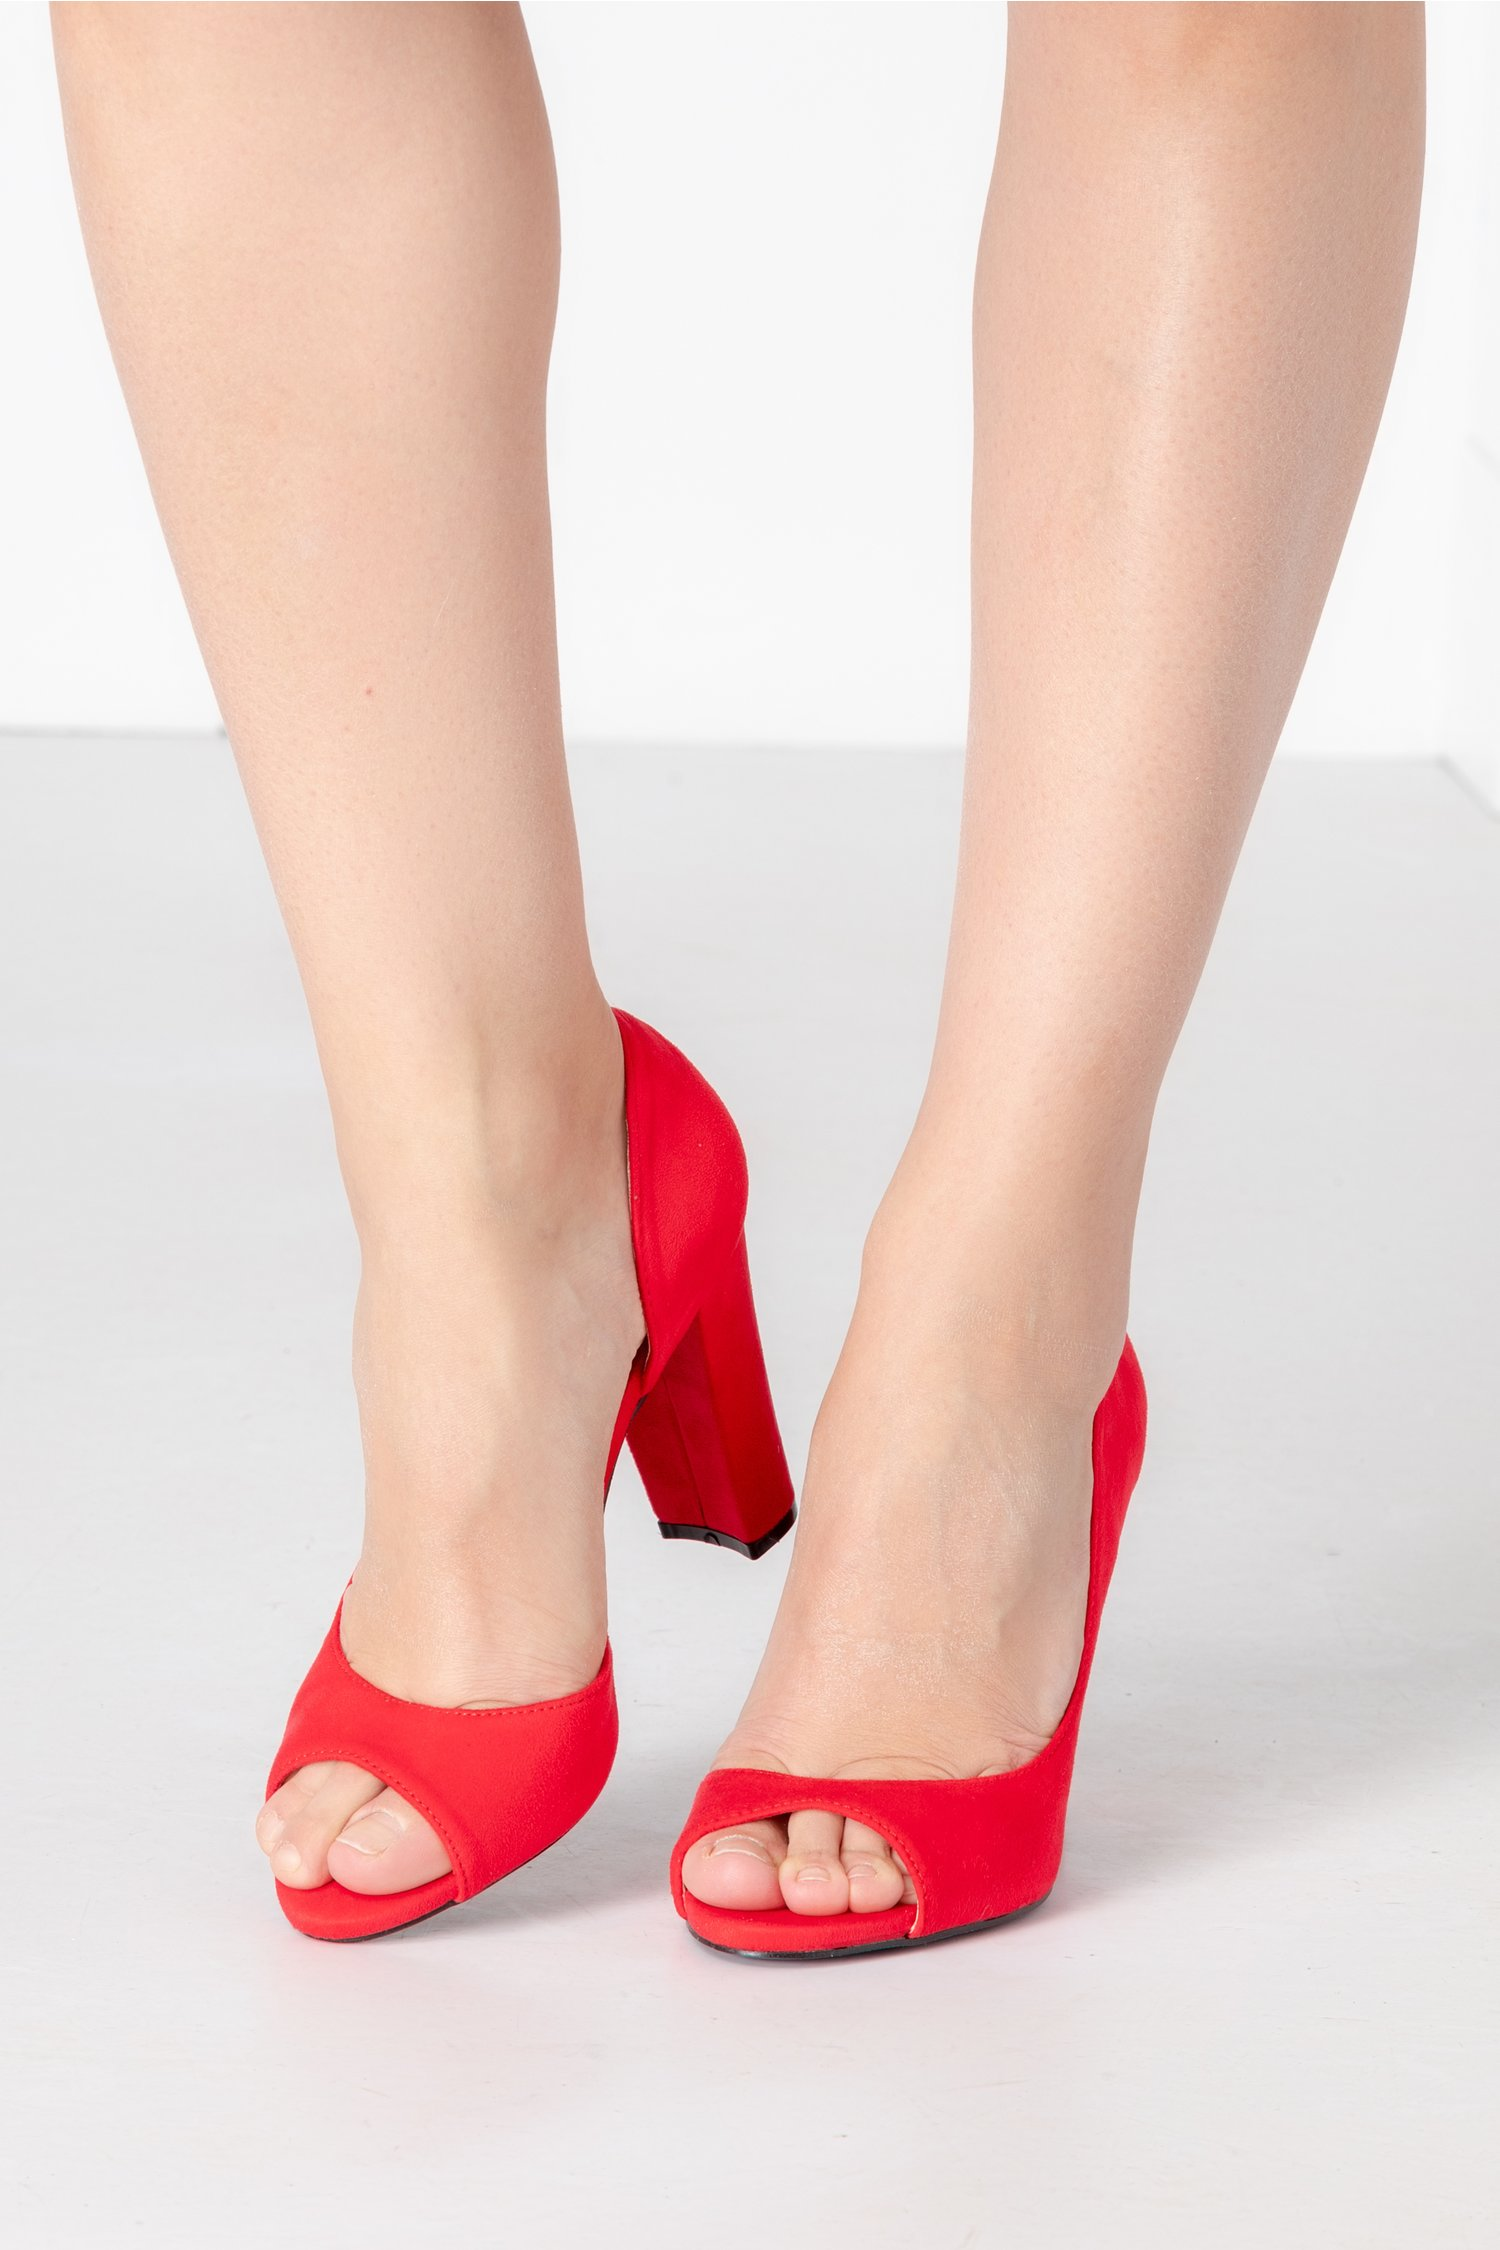 Pantofi dama rosii decupati